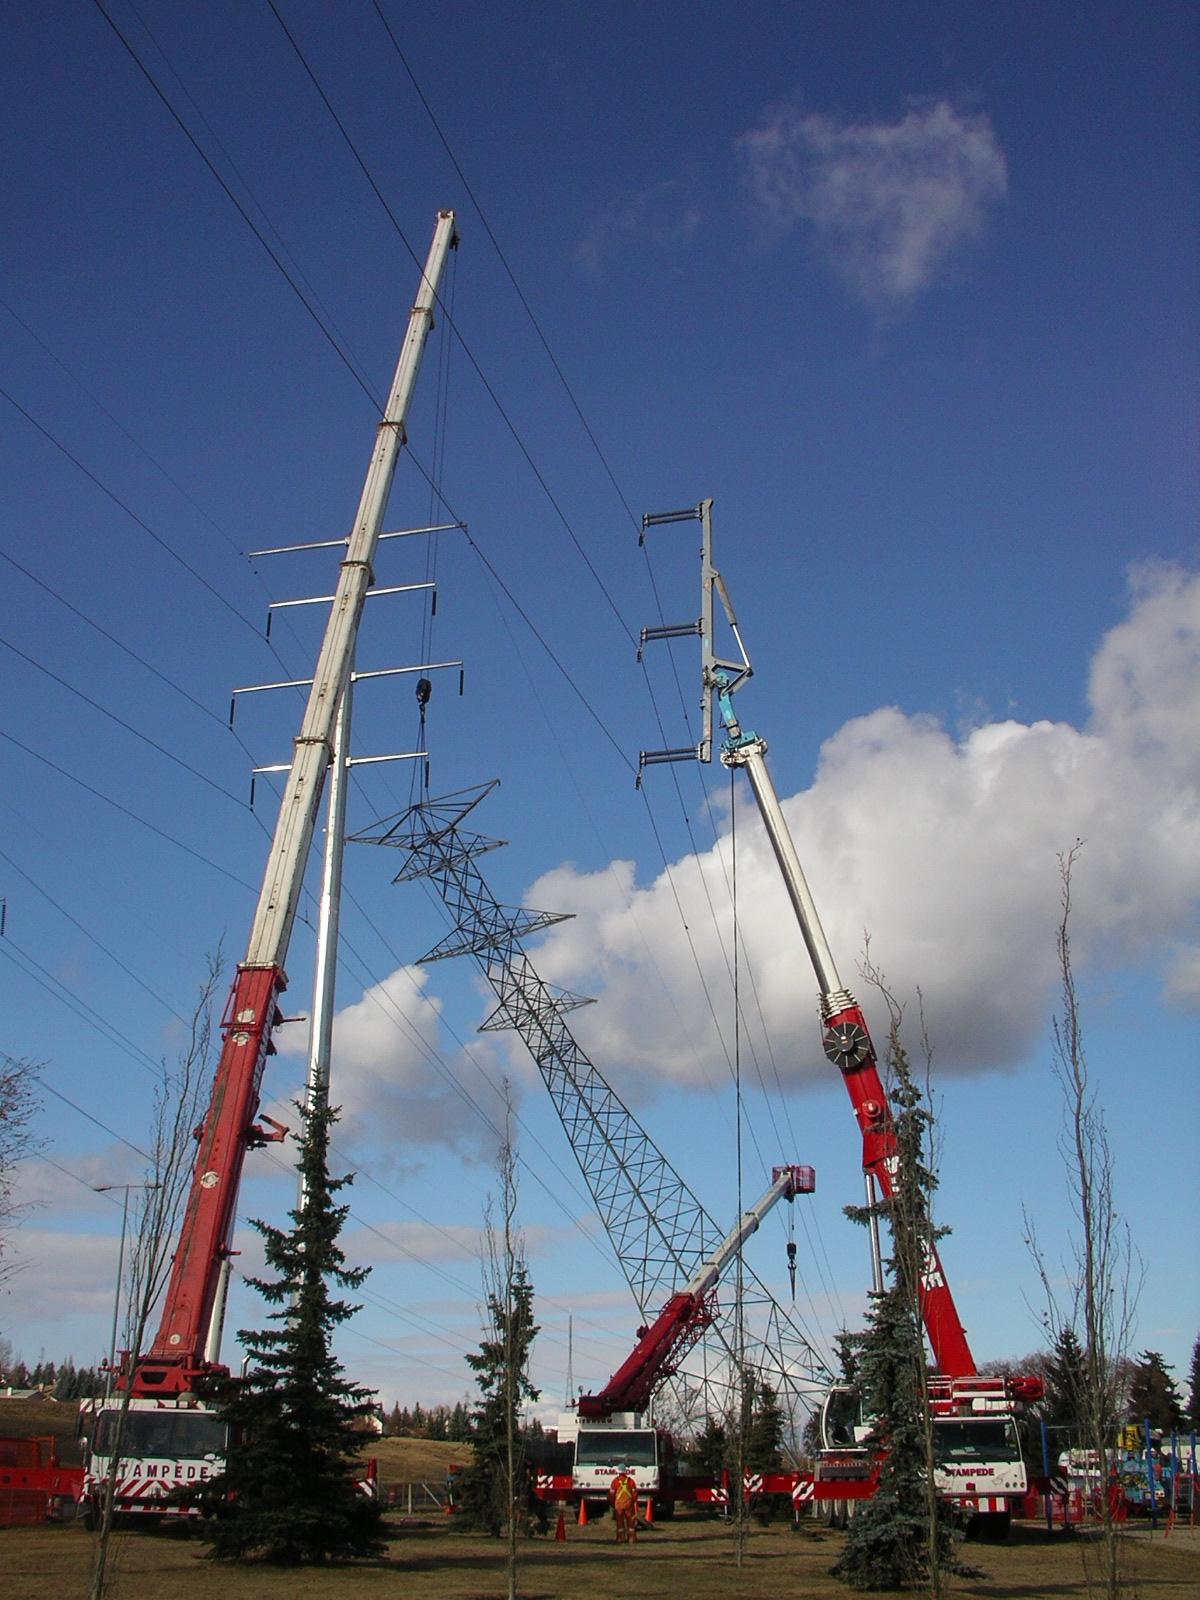 Overhead Crane Newfoundland : Coolest mobile crane photos all things cranes